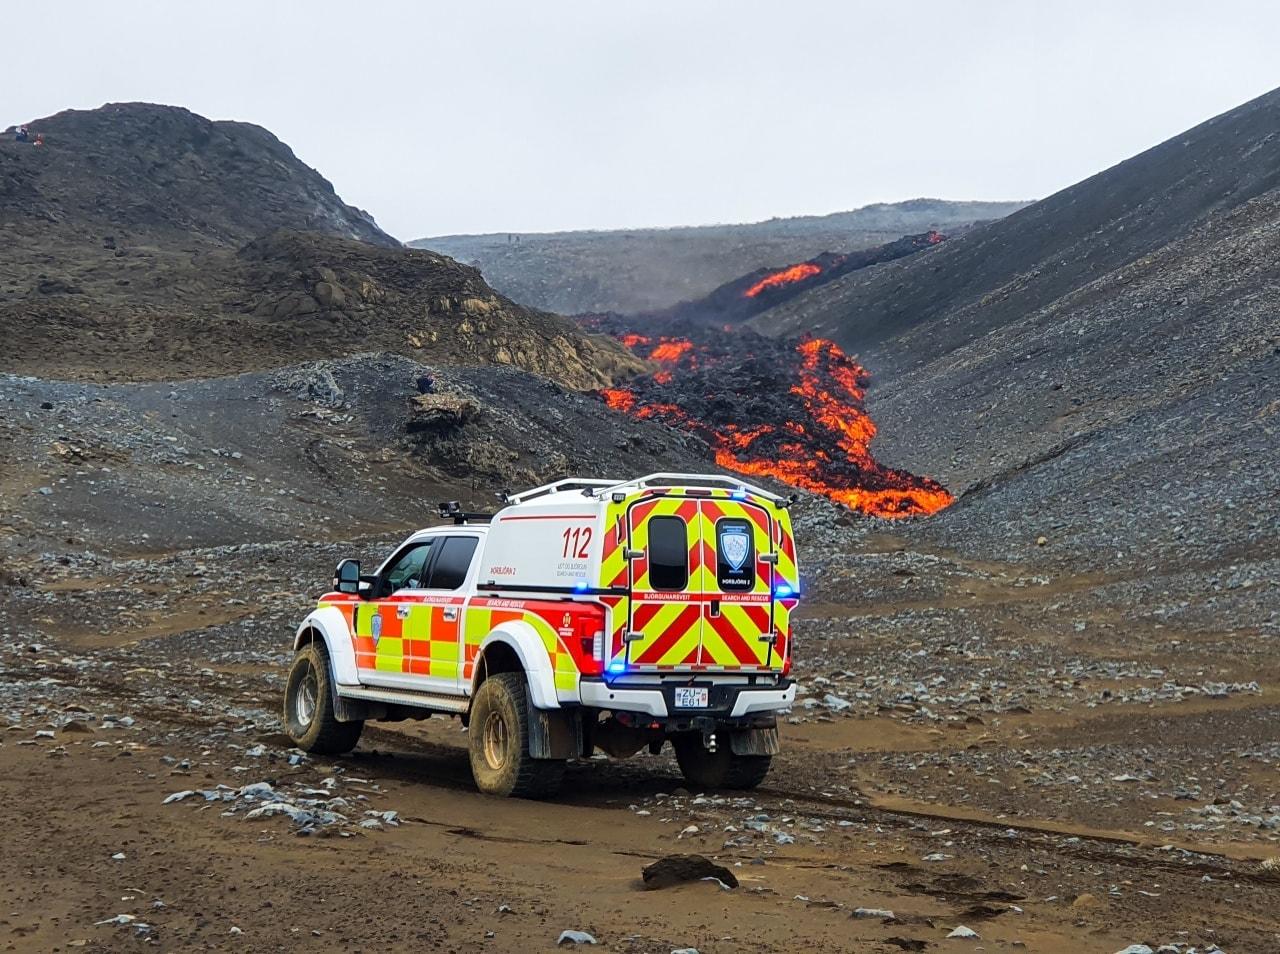 Yesterday's lava flow at Fagradalsfjall volcano (image: facebook.com/bjorgunarsveitinthorbjorn)